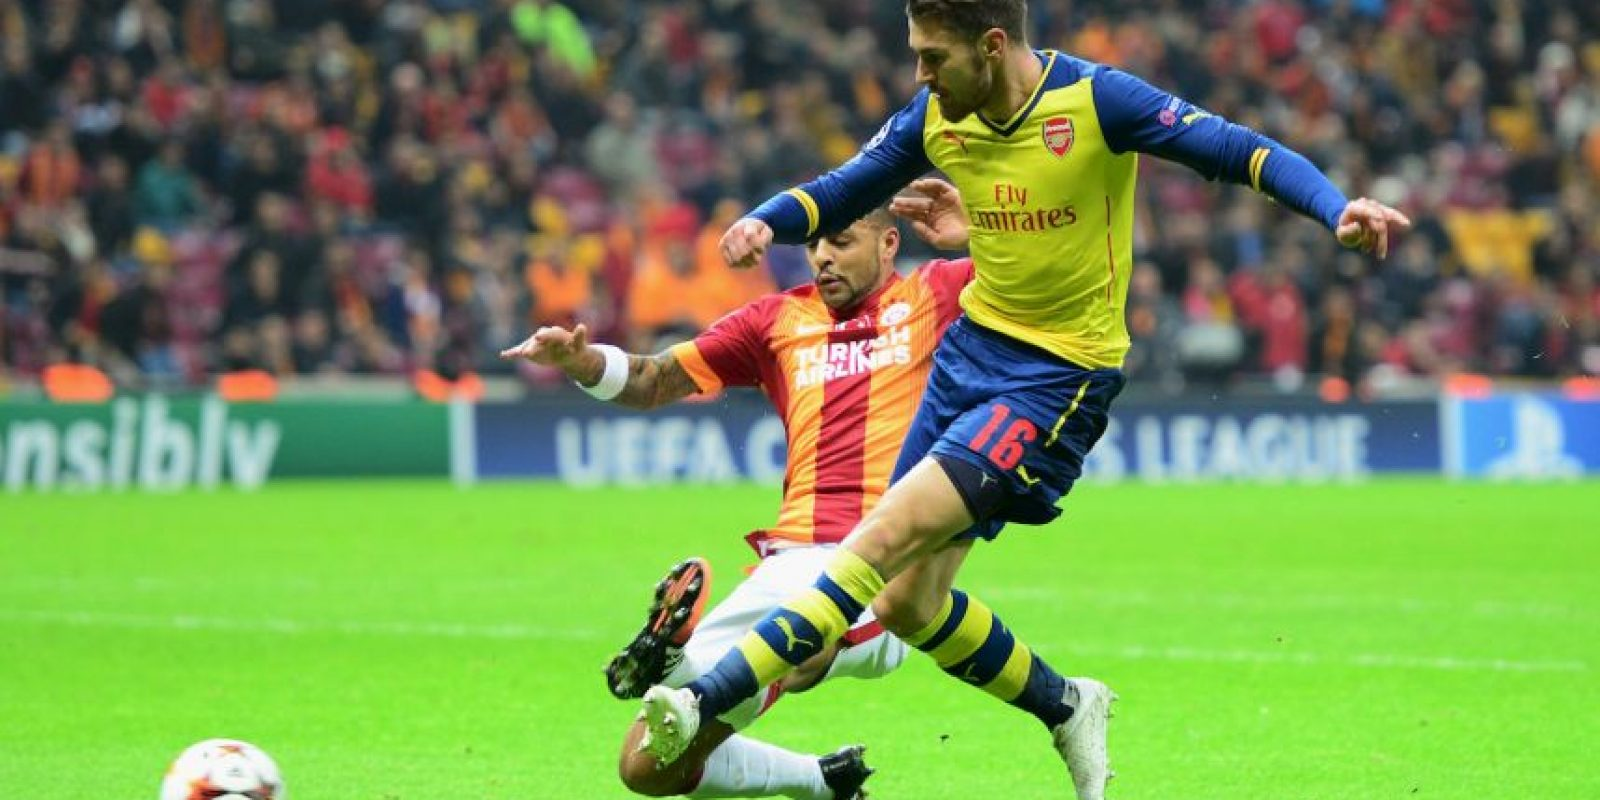 3. Gol de Aaron Ramsey (Arsenal) al Galatasaray. Foto:Getty Images